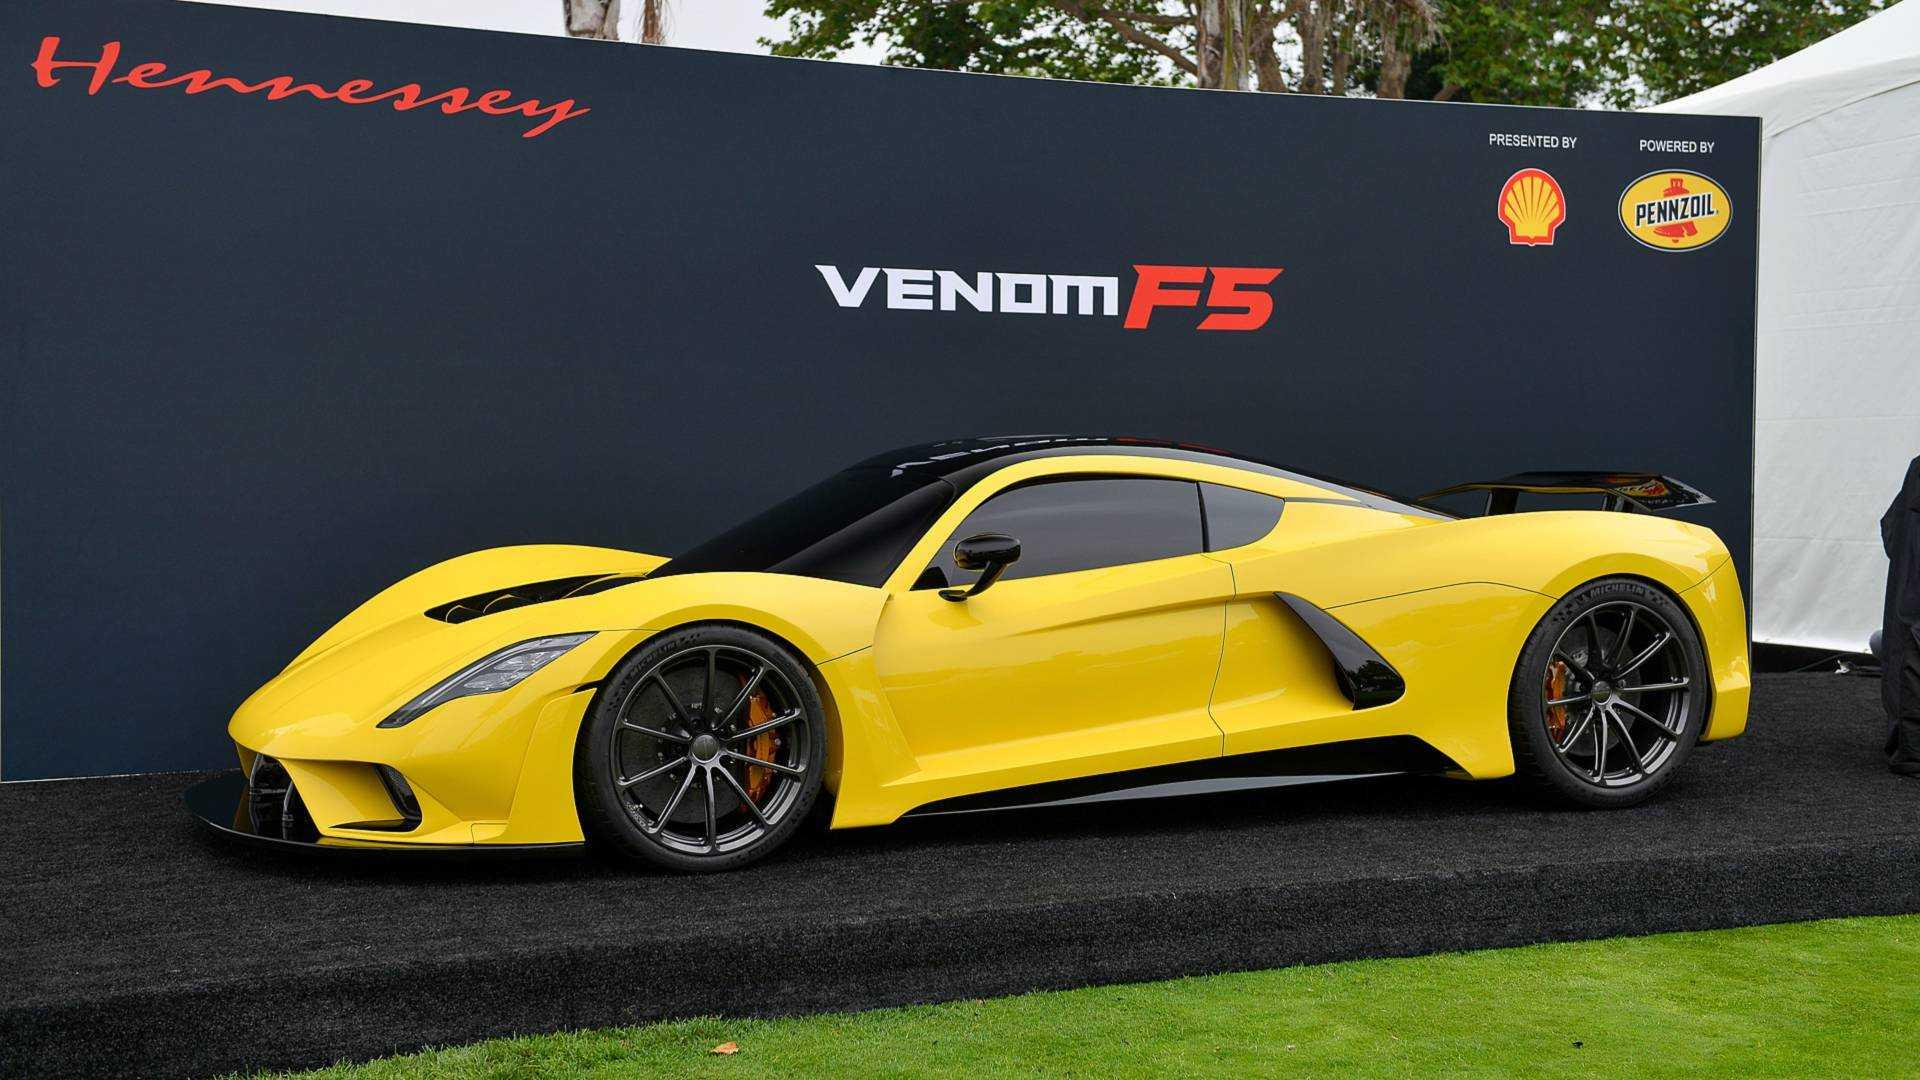 Venom Gt Price >> Hennessey Venom F5 Targets 311 Mph Top Speed